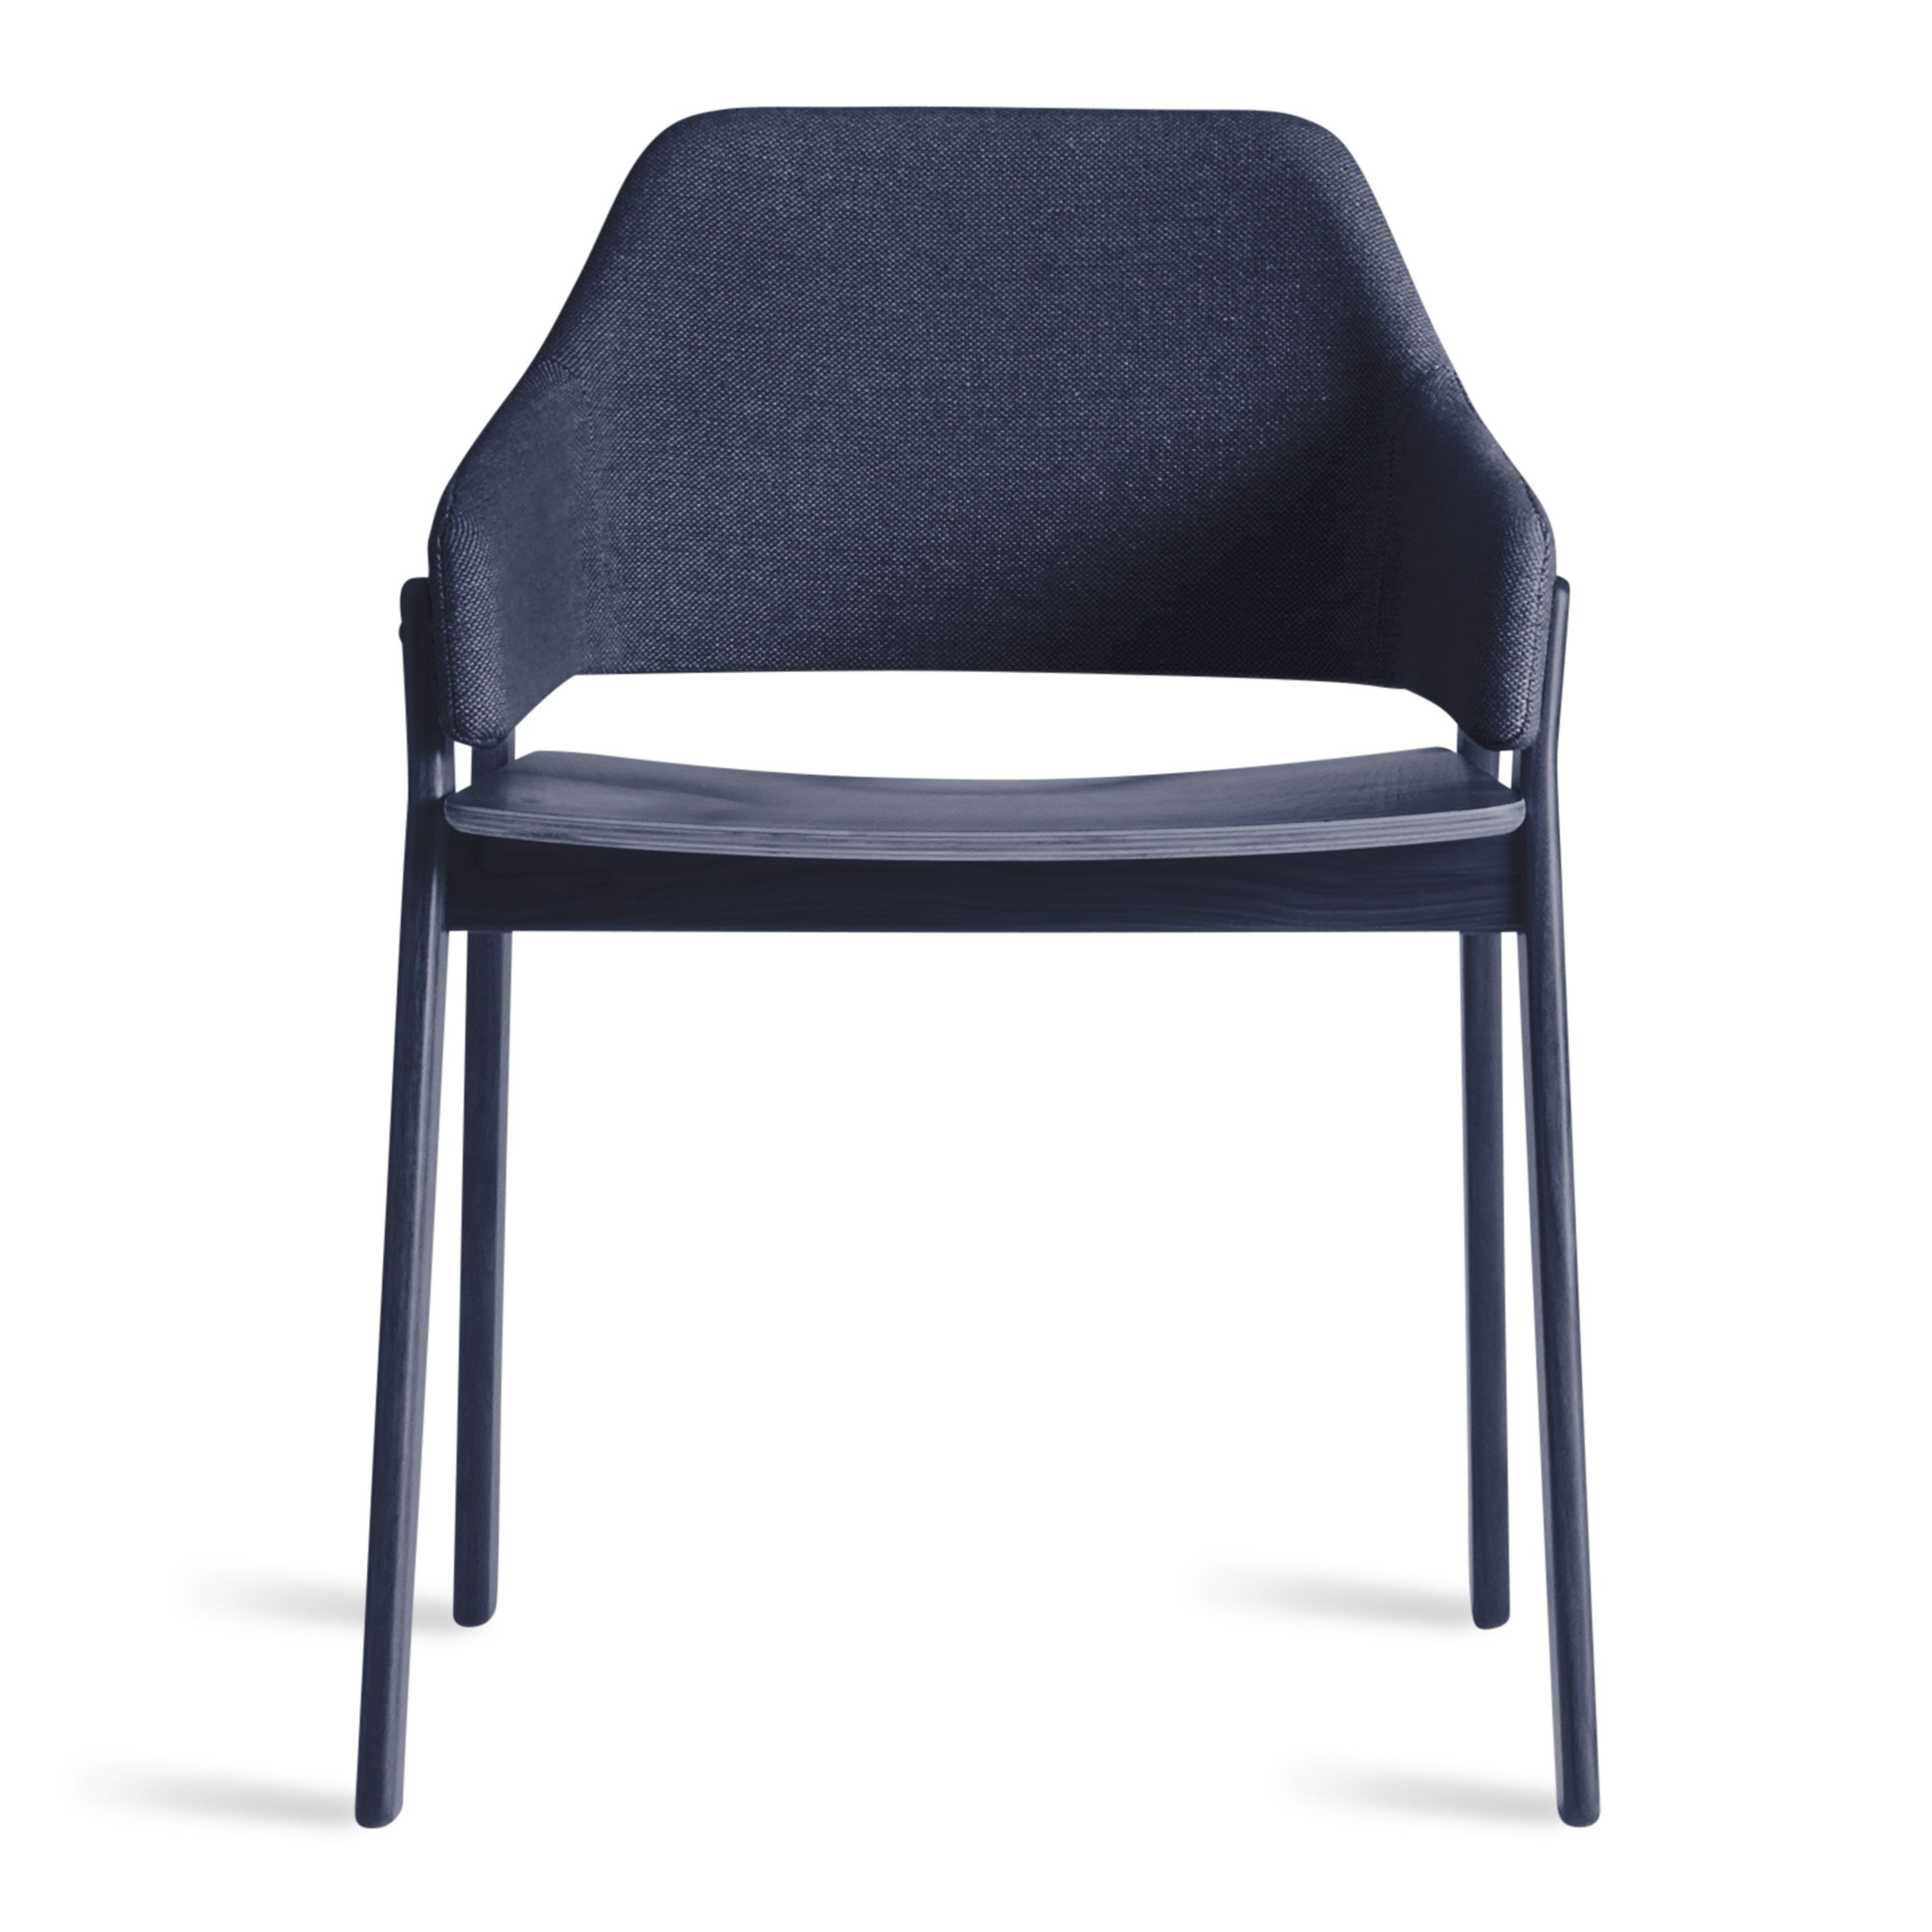 cgtrader mtl max models obj model dot chair blu mesh hot furniture